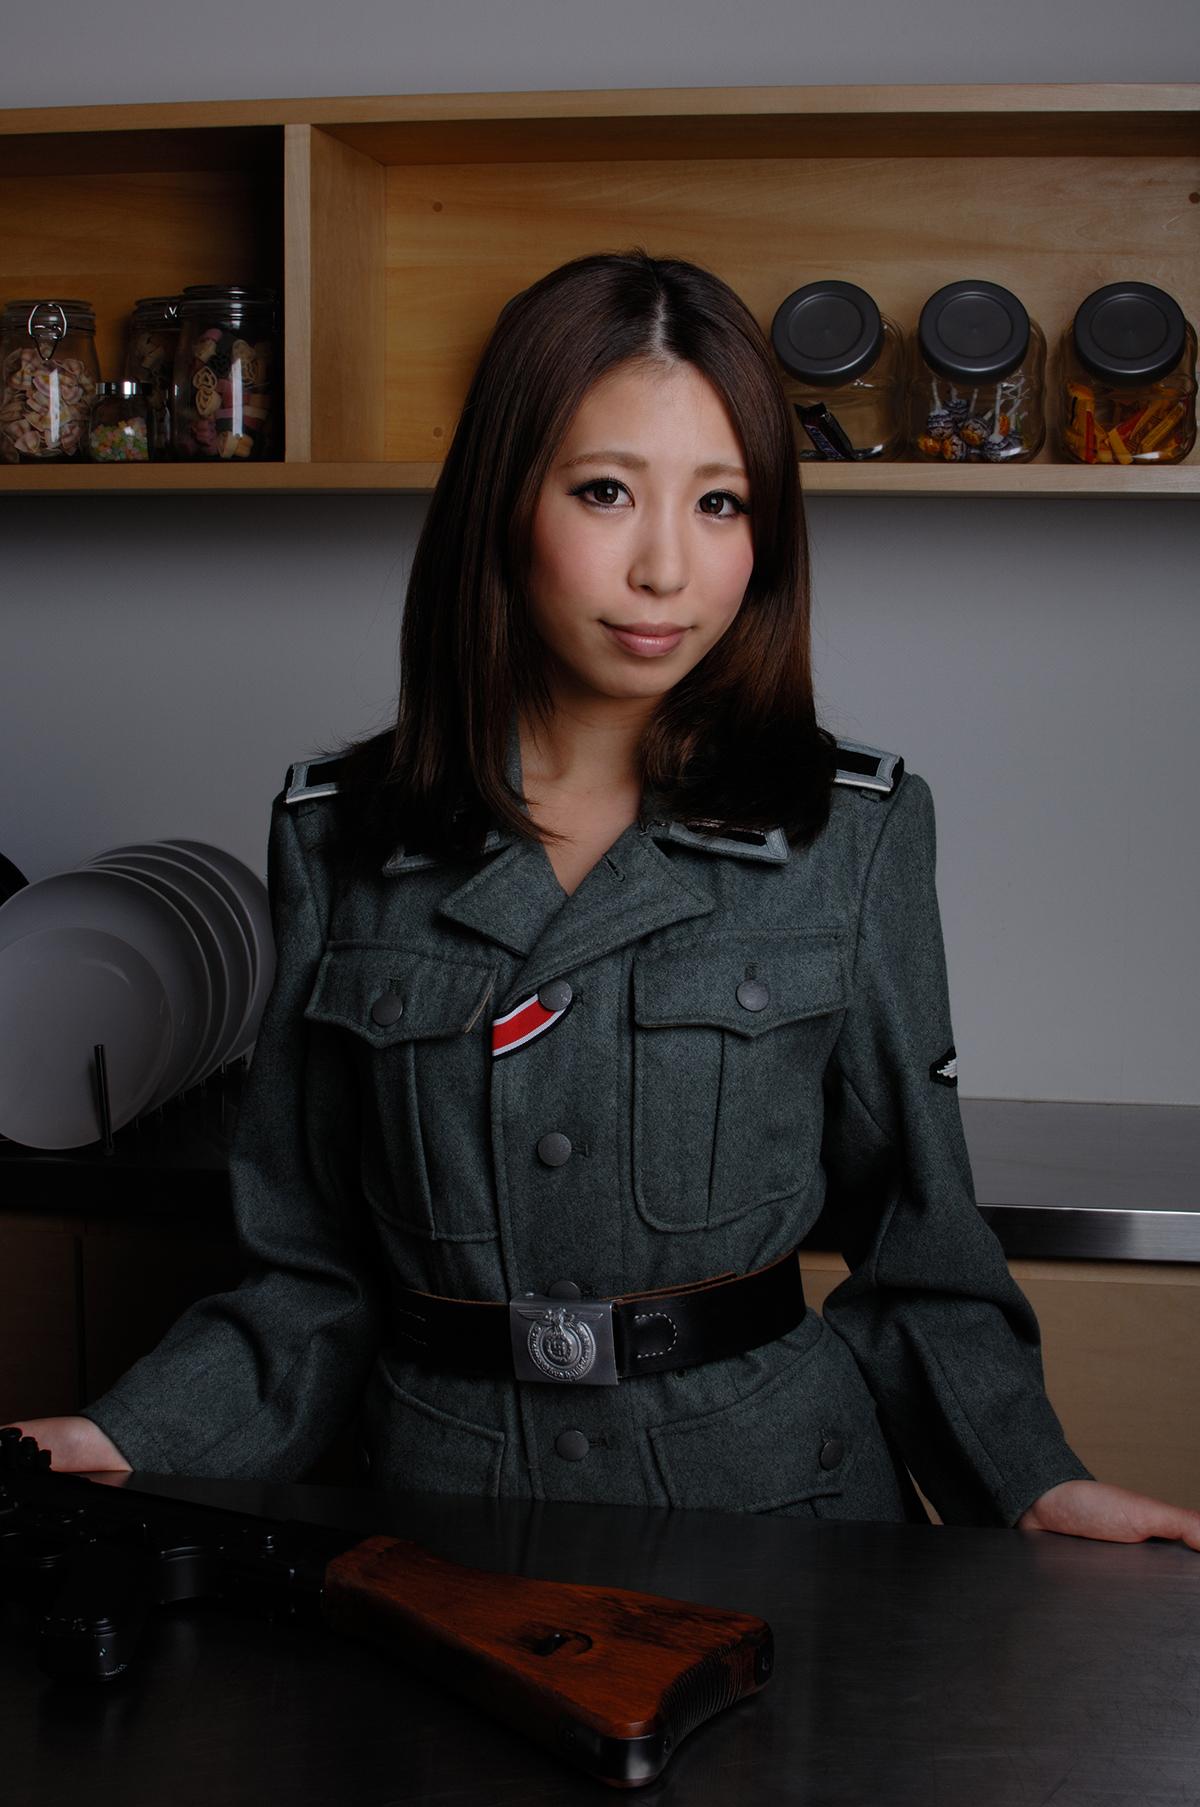 MP43用ストック/松栄製